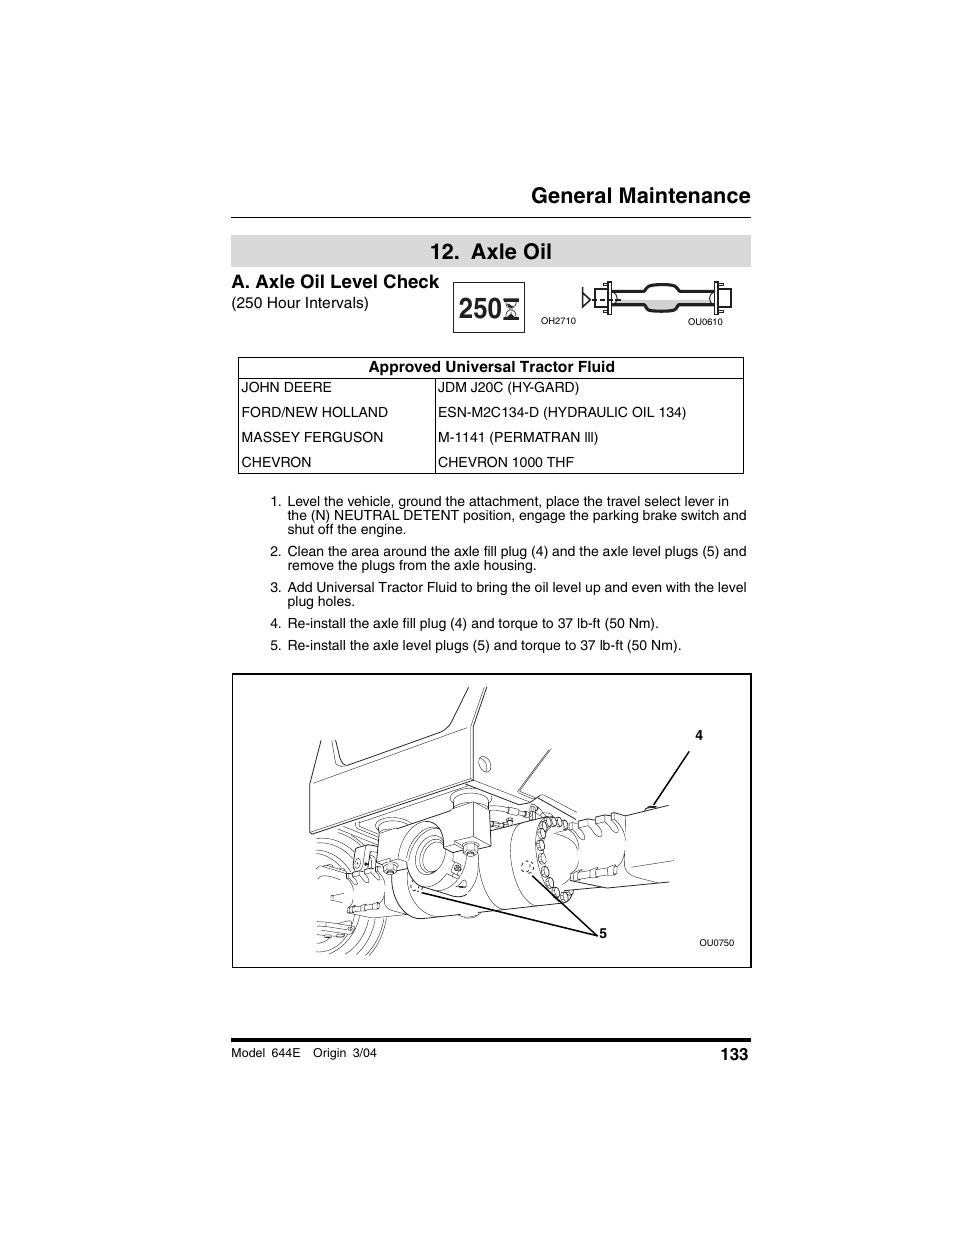 axle oil, A  axle oil level check, 250 hour intervals